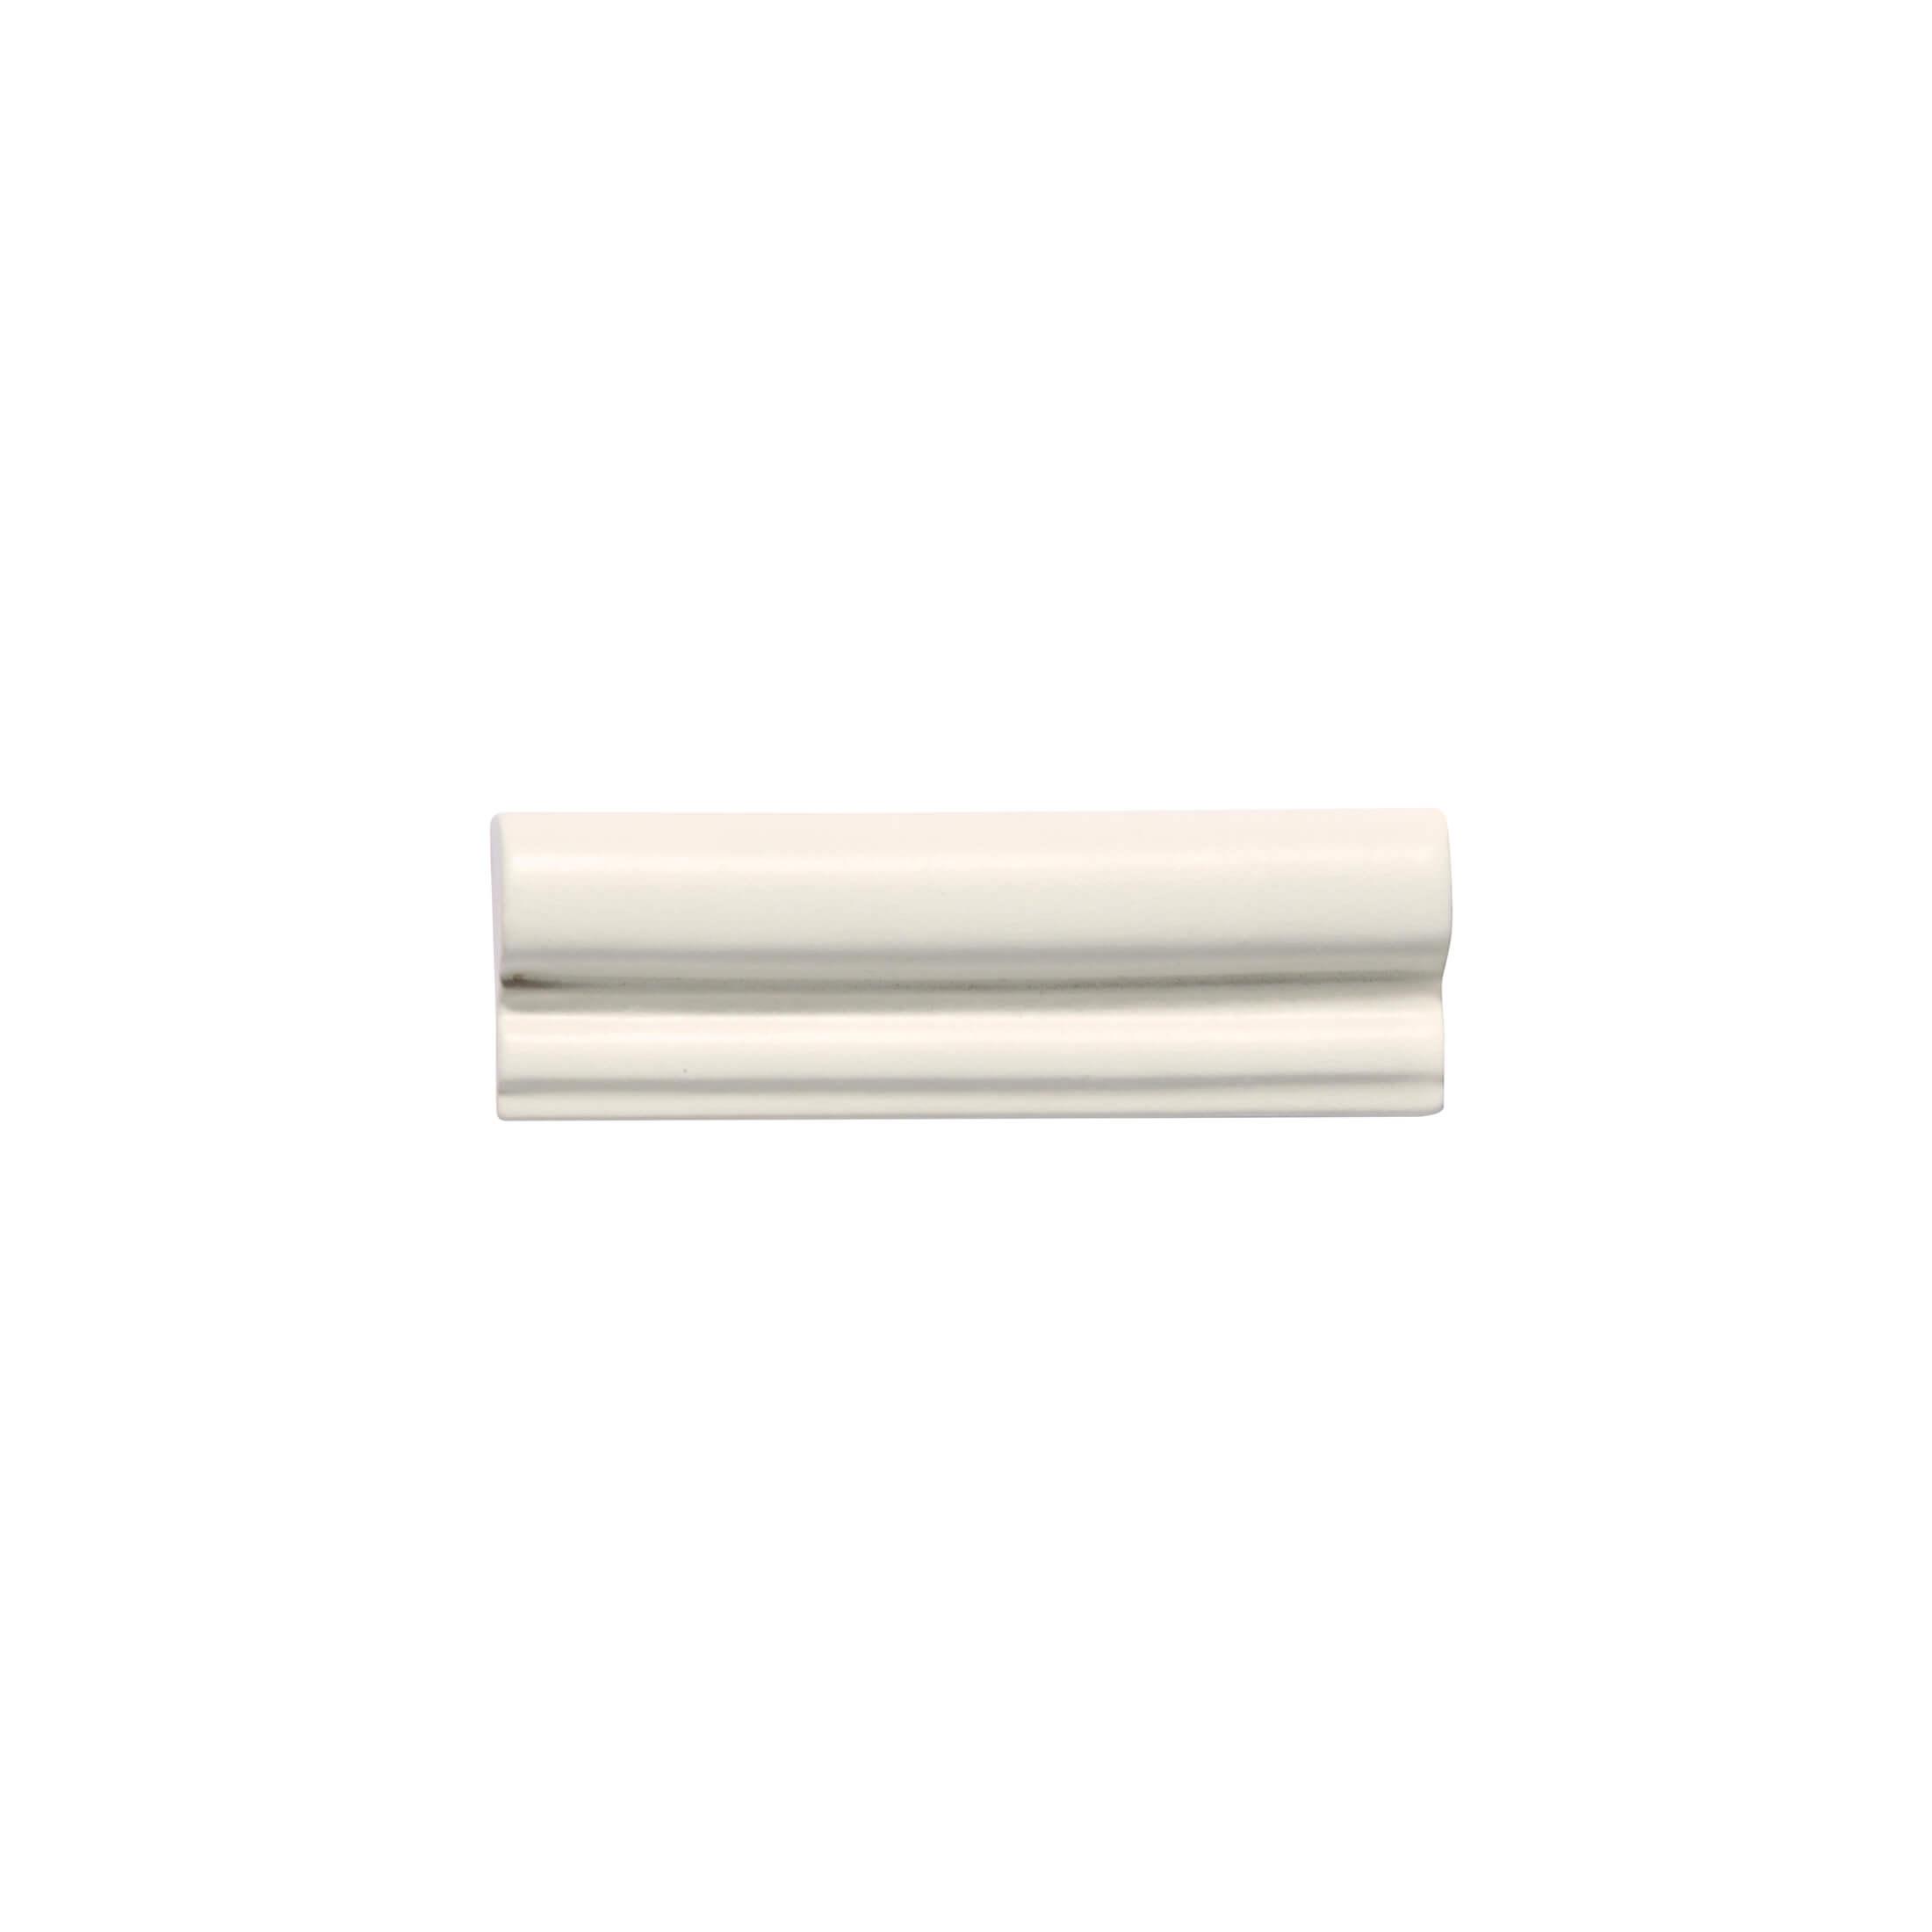 ADNT5022 - MOLDURA  - 5 cm X 15 cm